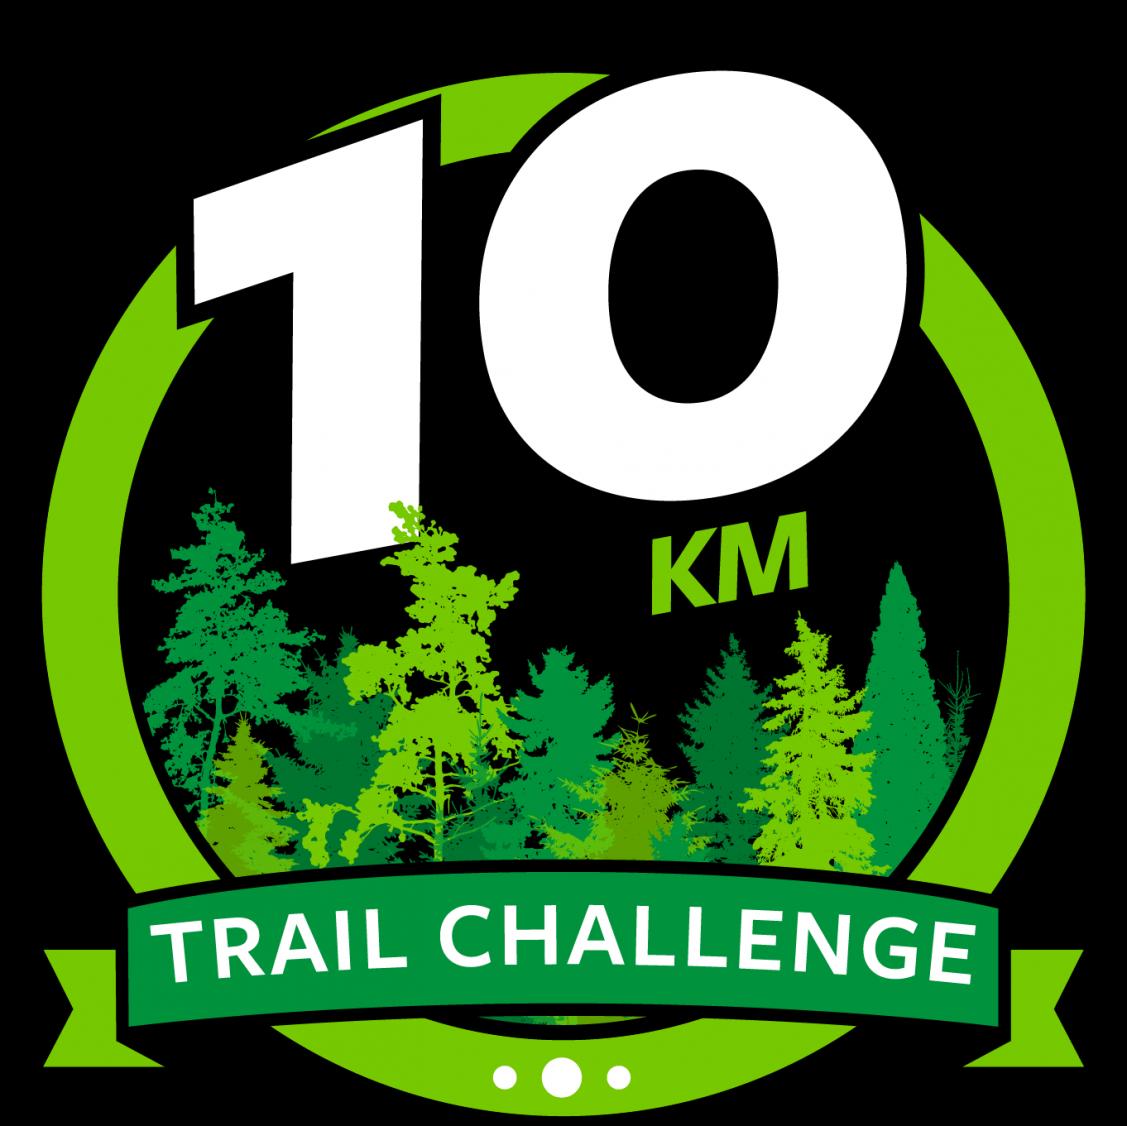 Run Forest Run - 10 km skogsløp